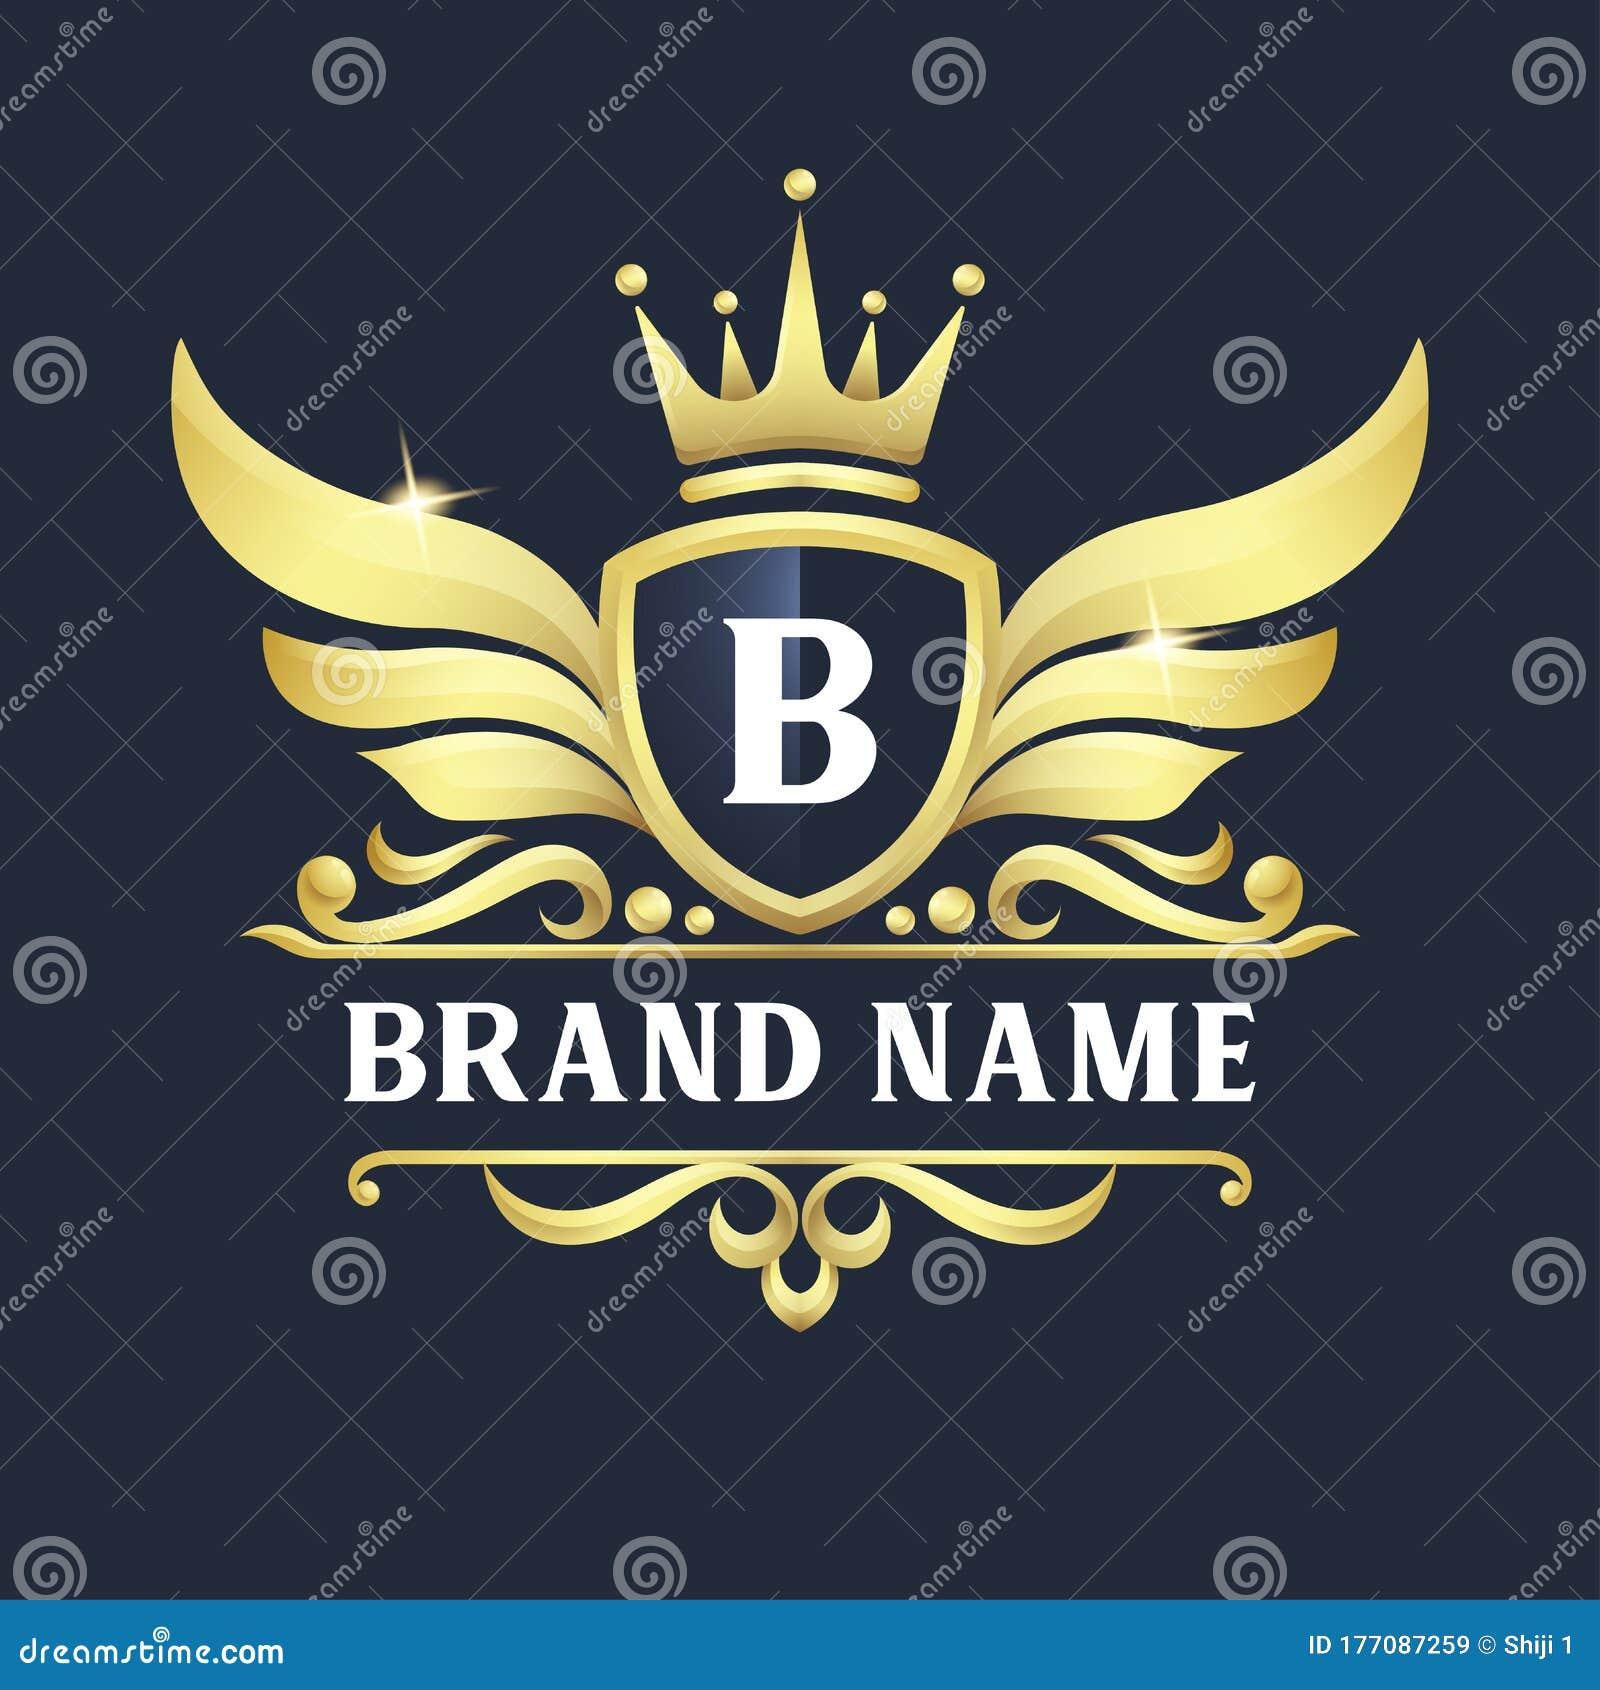 Luxurious Retro Brand Logo Collection: Luxury Badge Logo Design Premium Vector Stock Vector